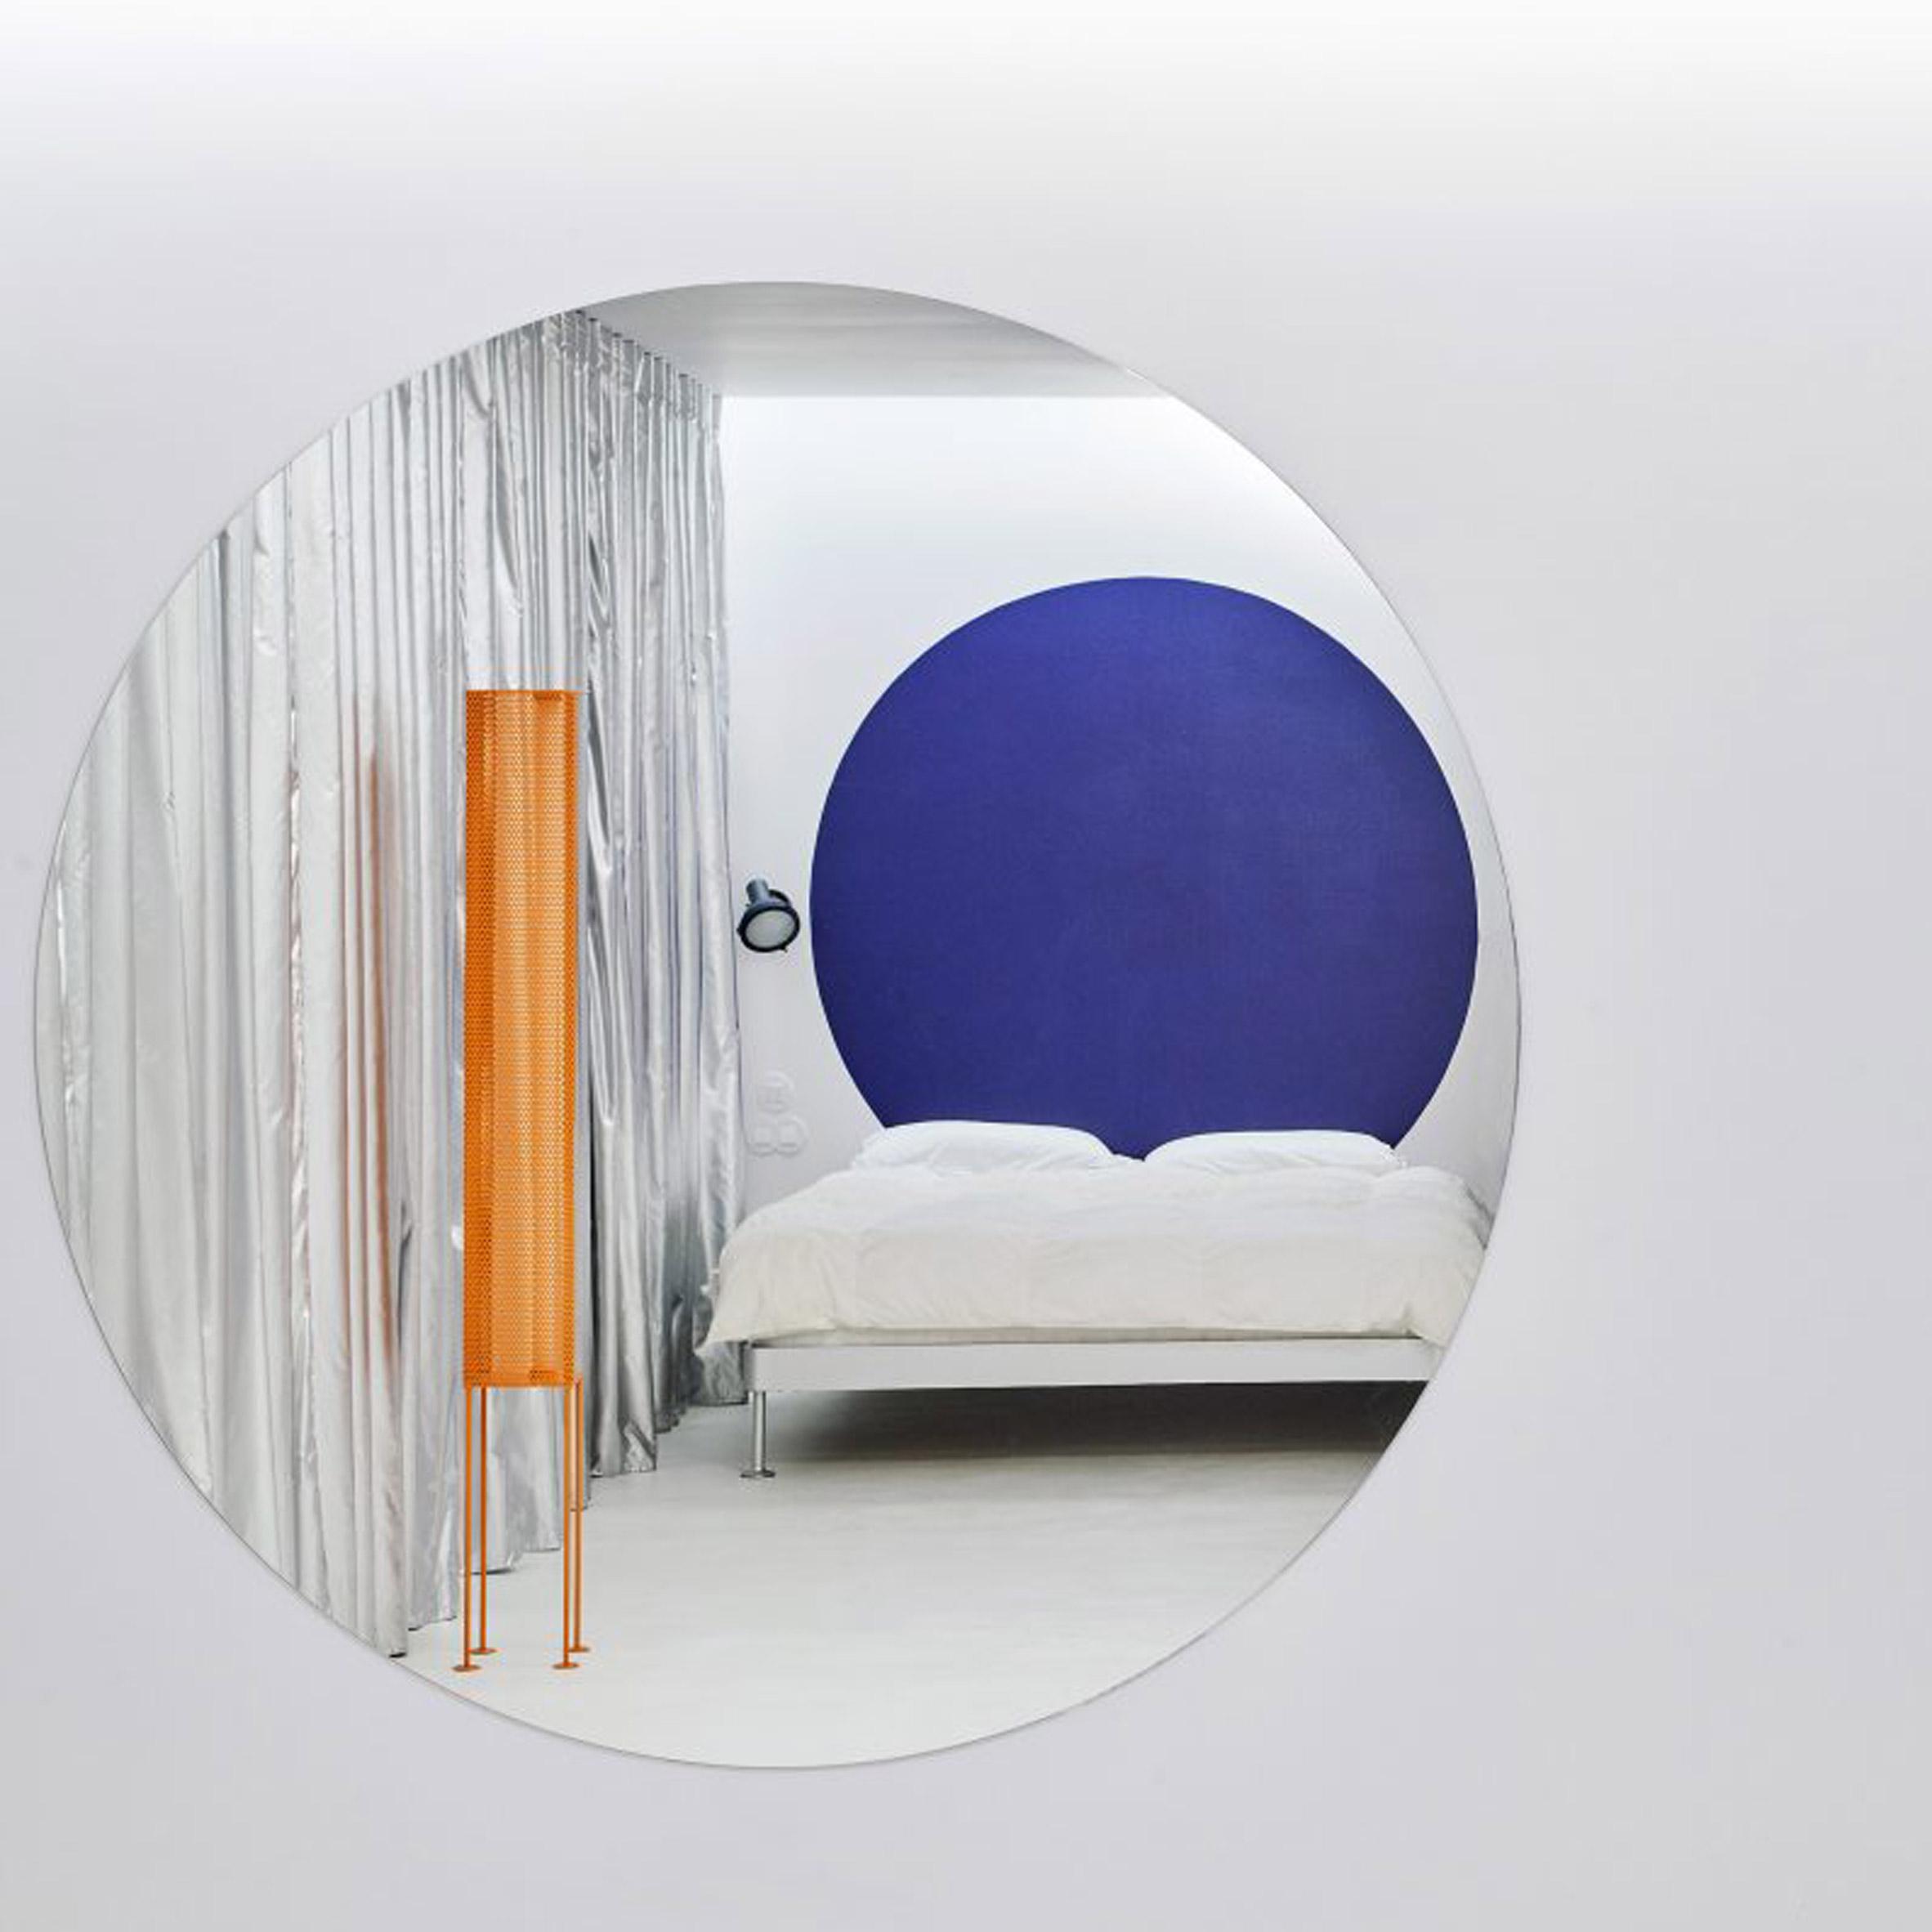 Statement walls roundup: Casa A12